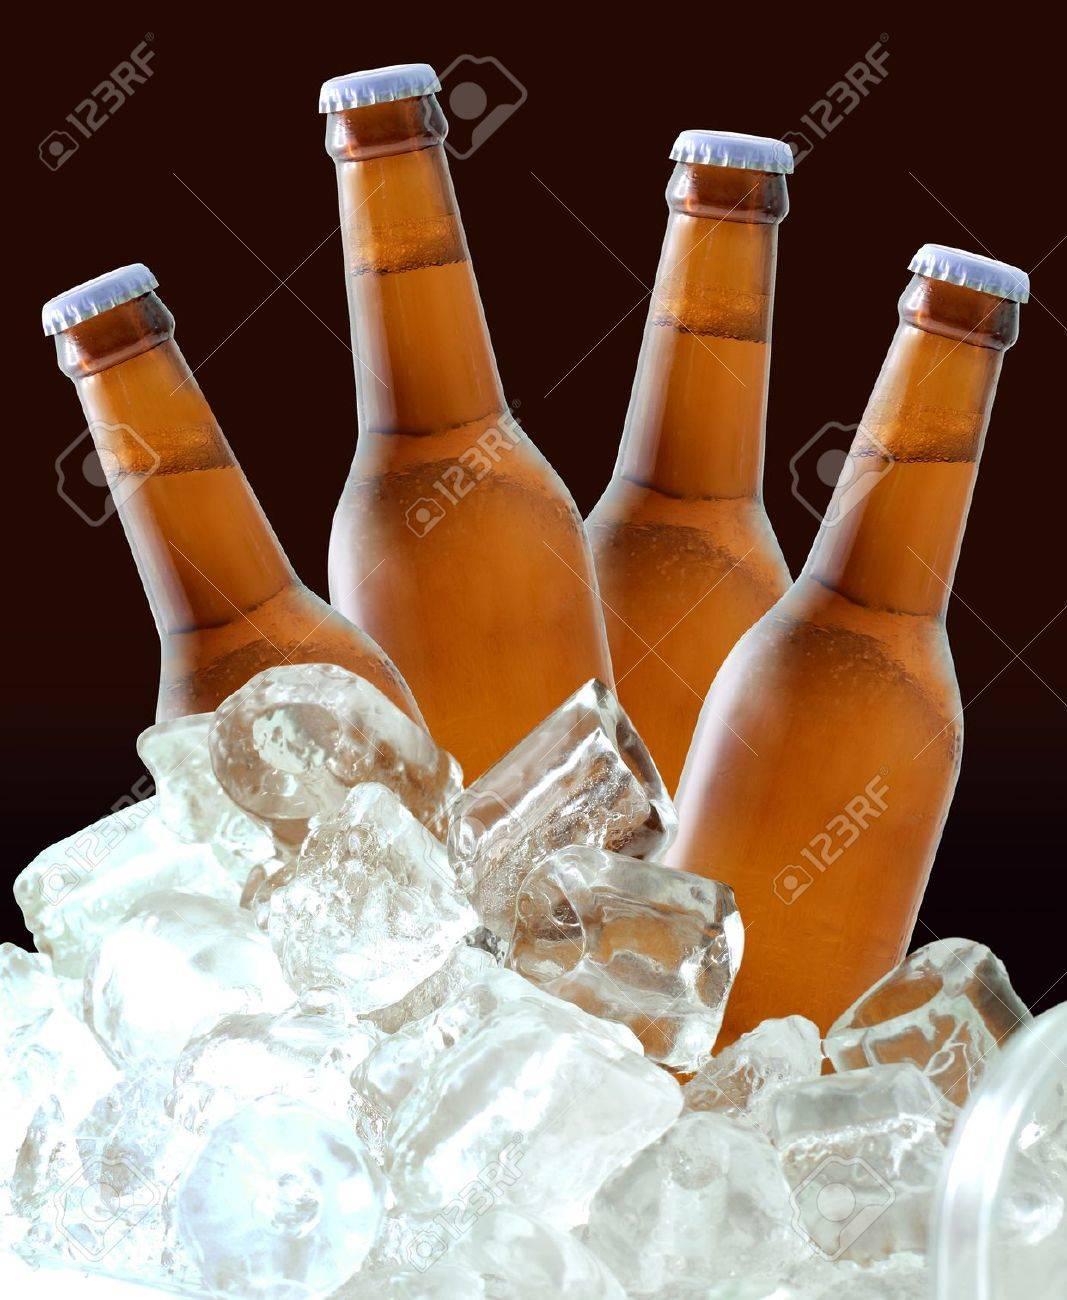 Beer bottles on ice Stock Photo - 11932847